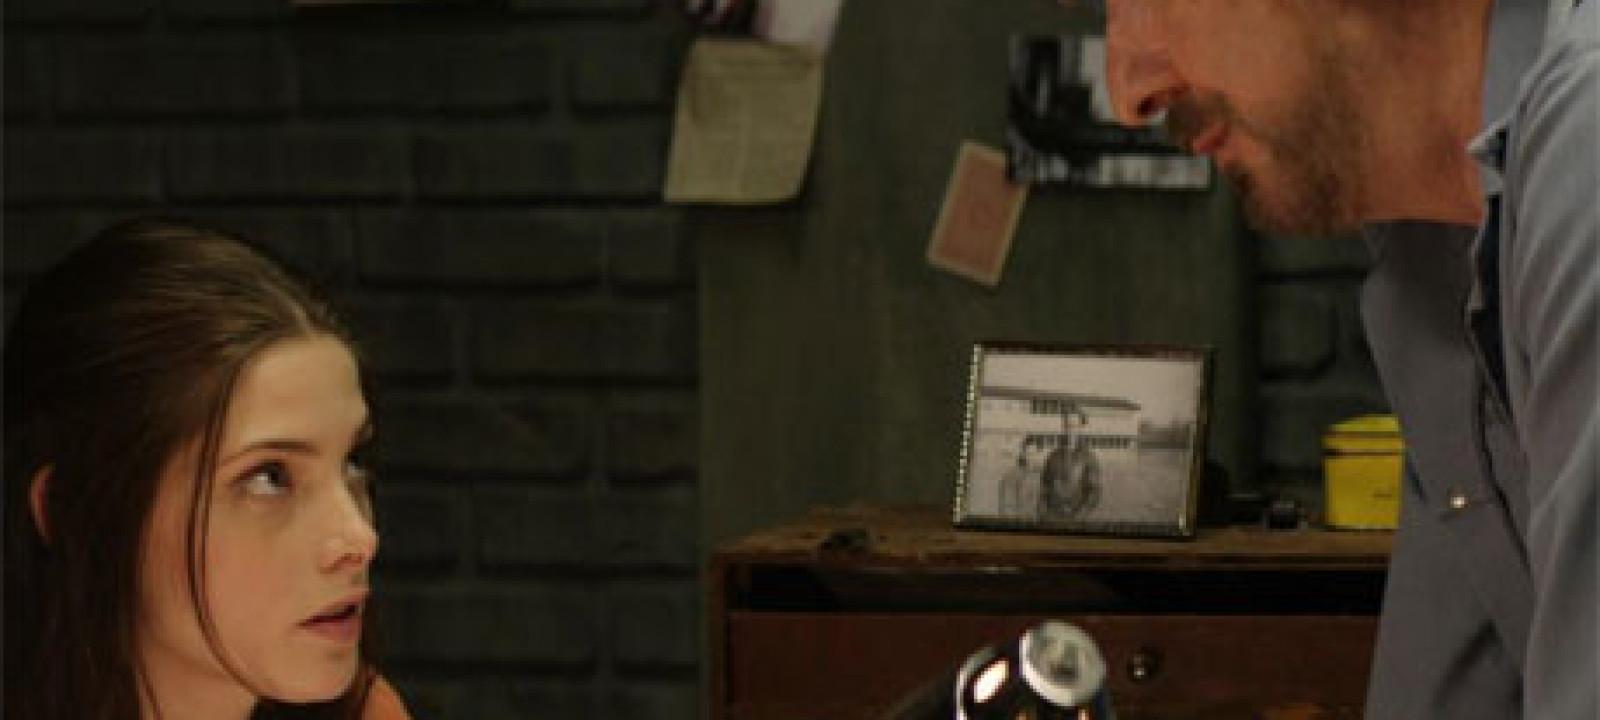 Alan Rickman in 'CBGB'